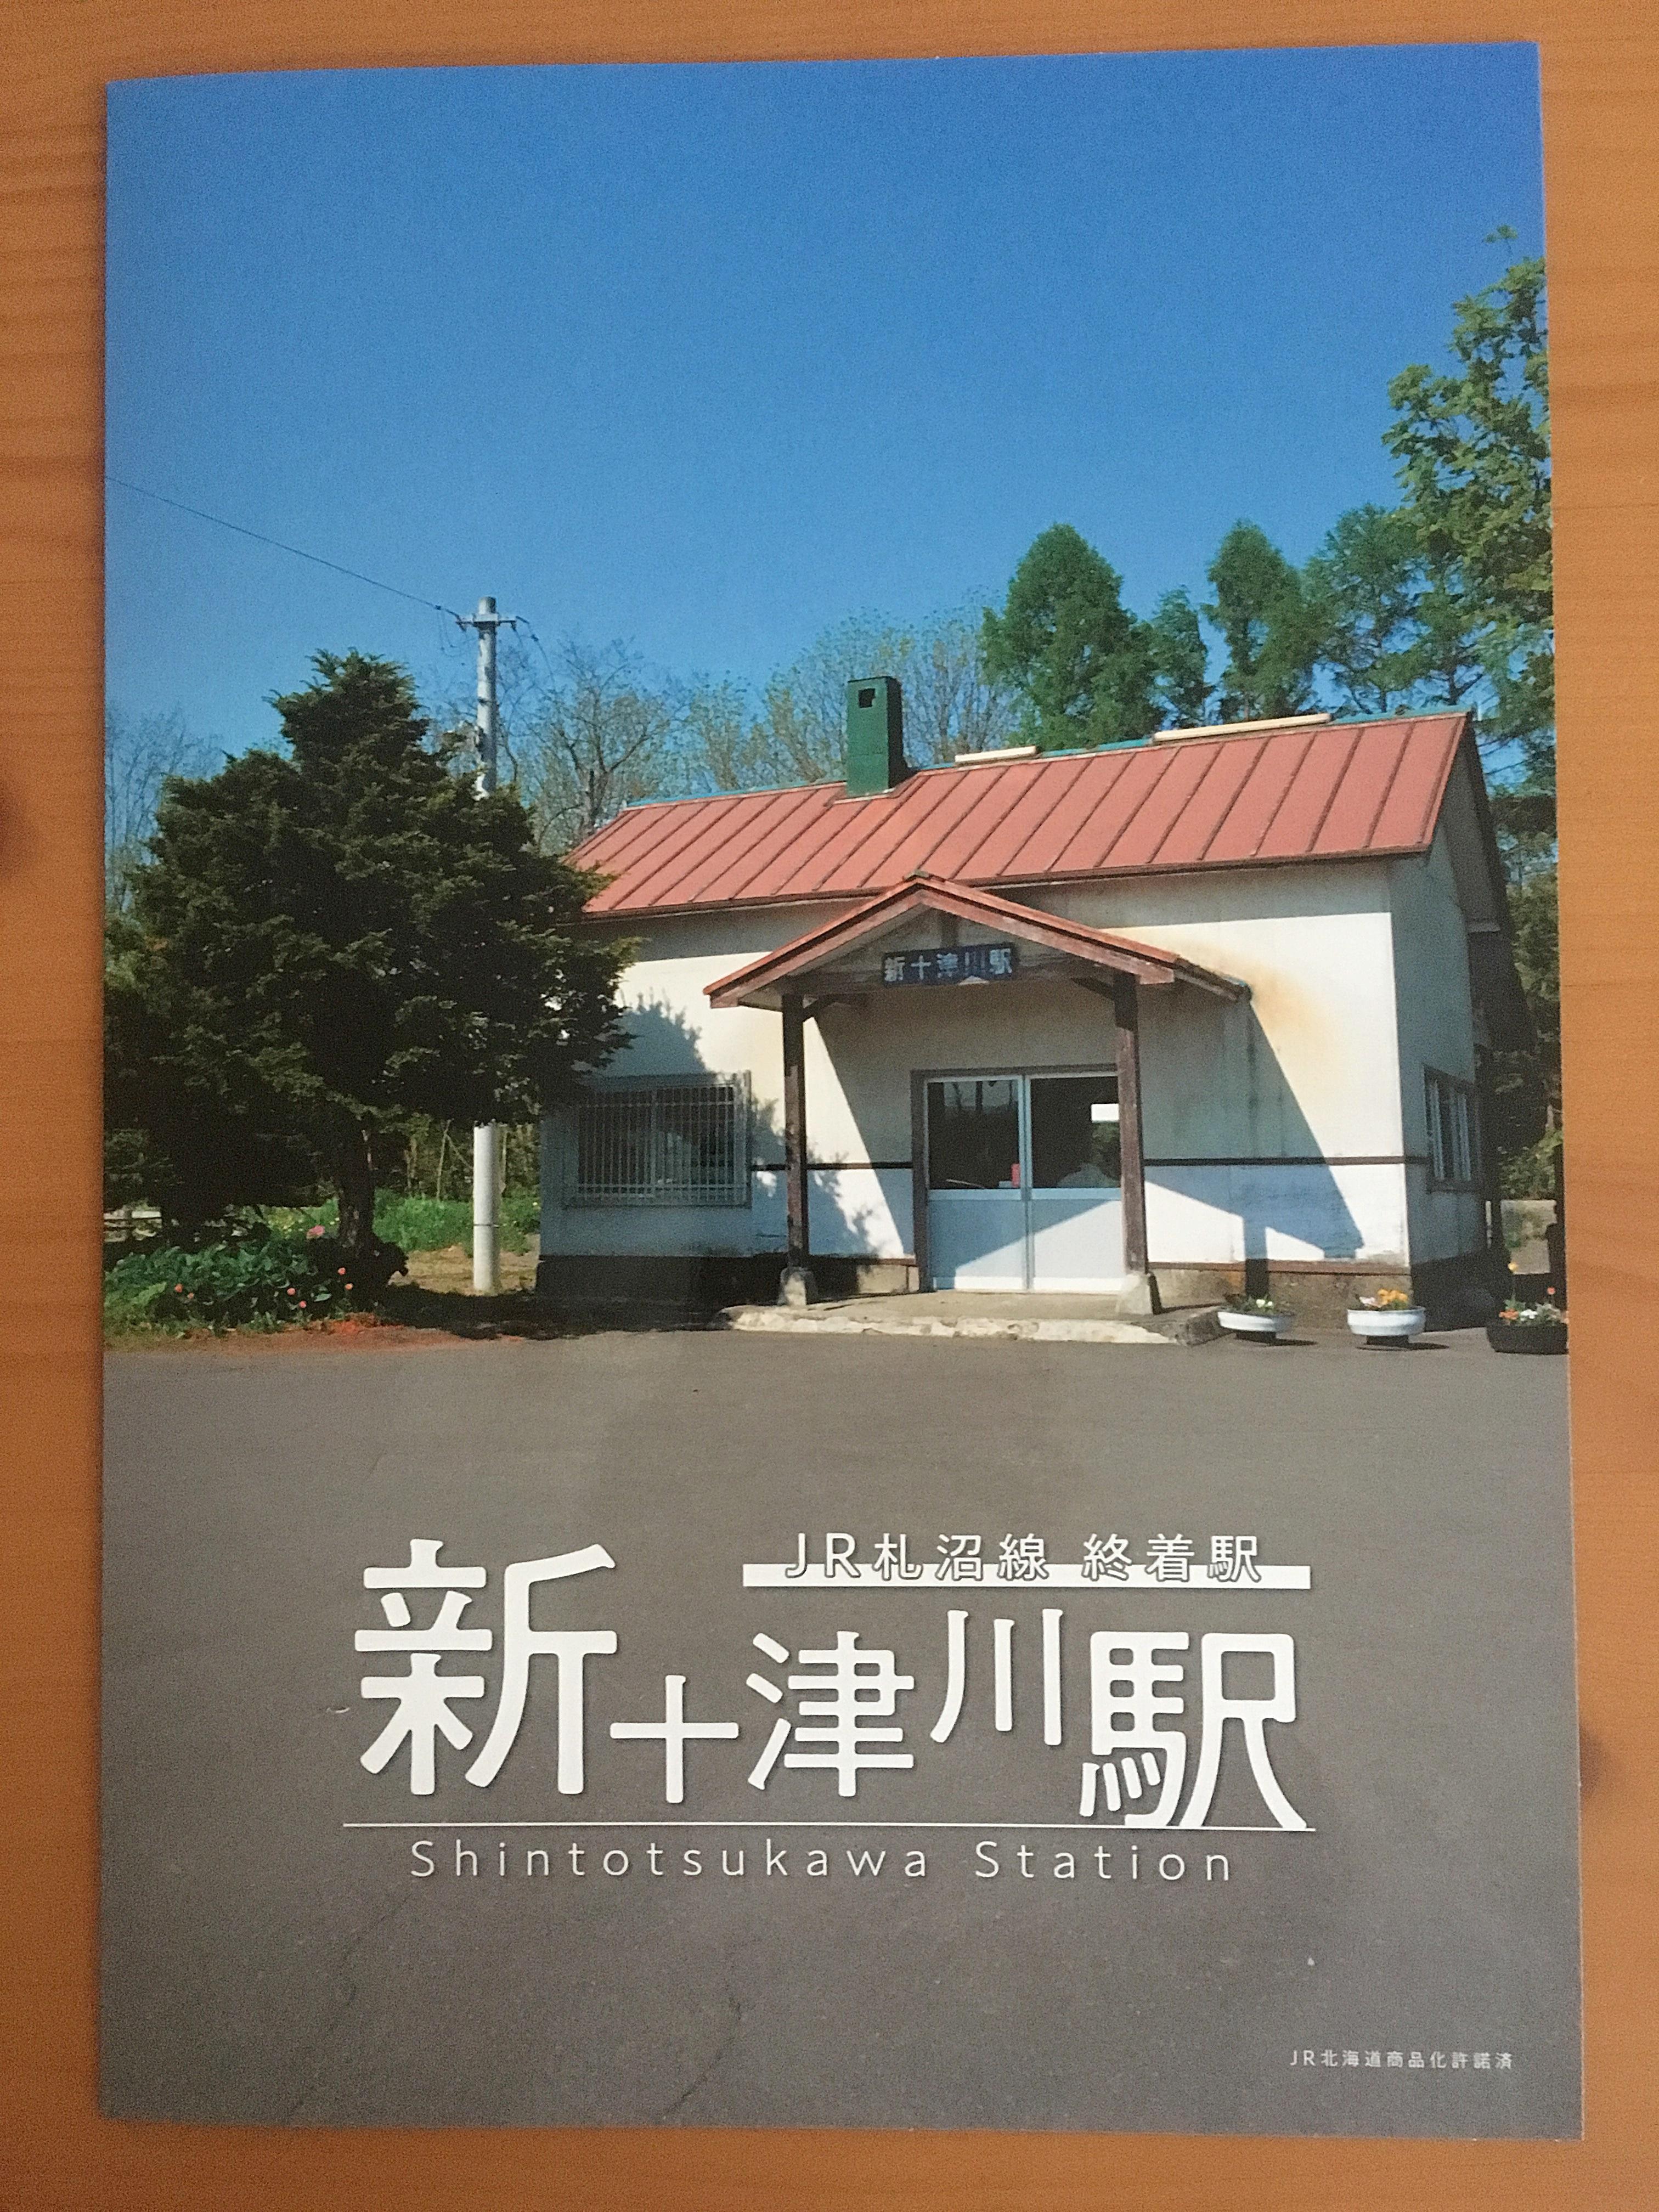 JR札沼線 終着駅 新十津川駅フレーム切手 表紙.JPG